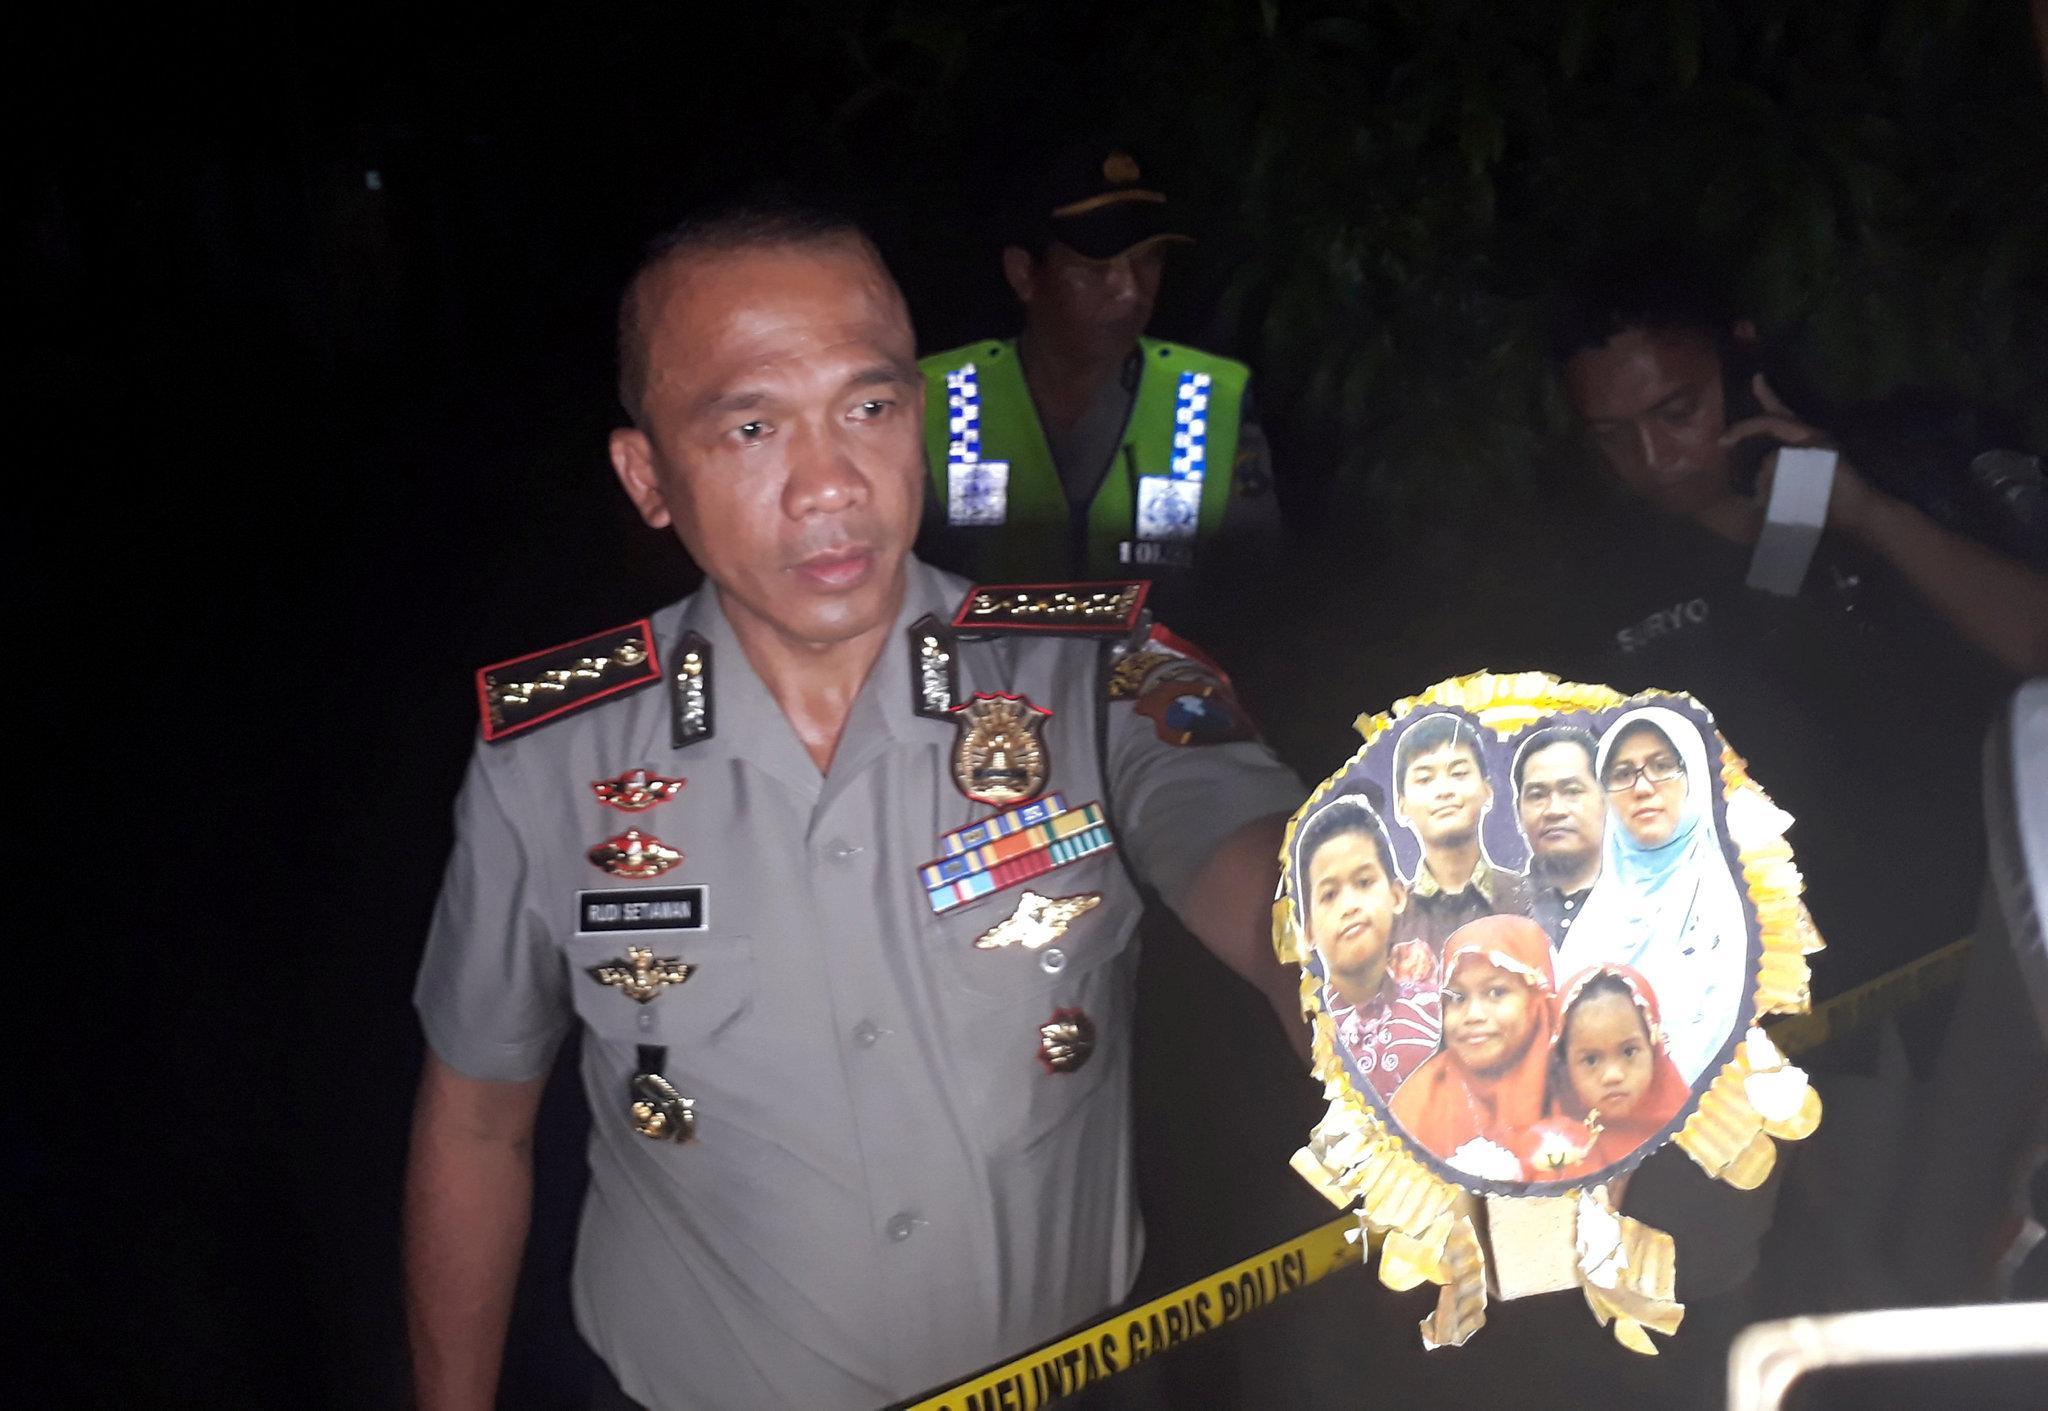 dang sau phuong thuc danh bom tu sat kinh hoang o indonesia